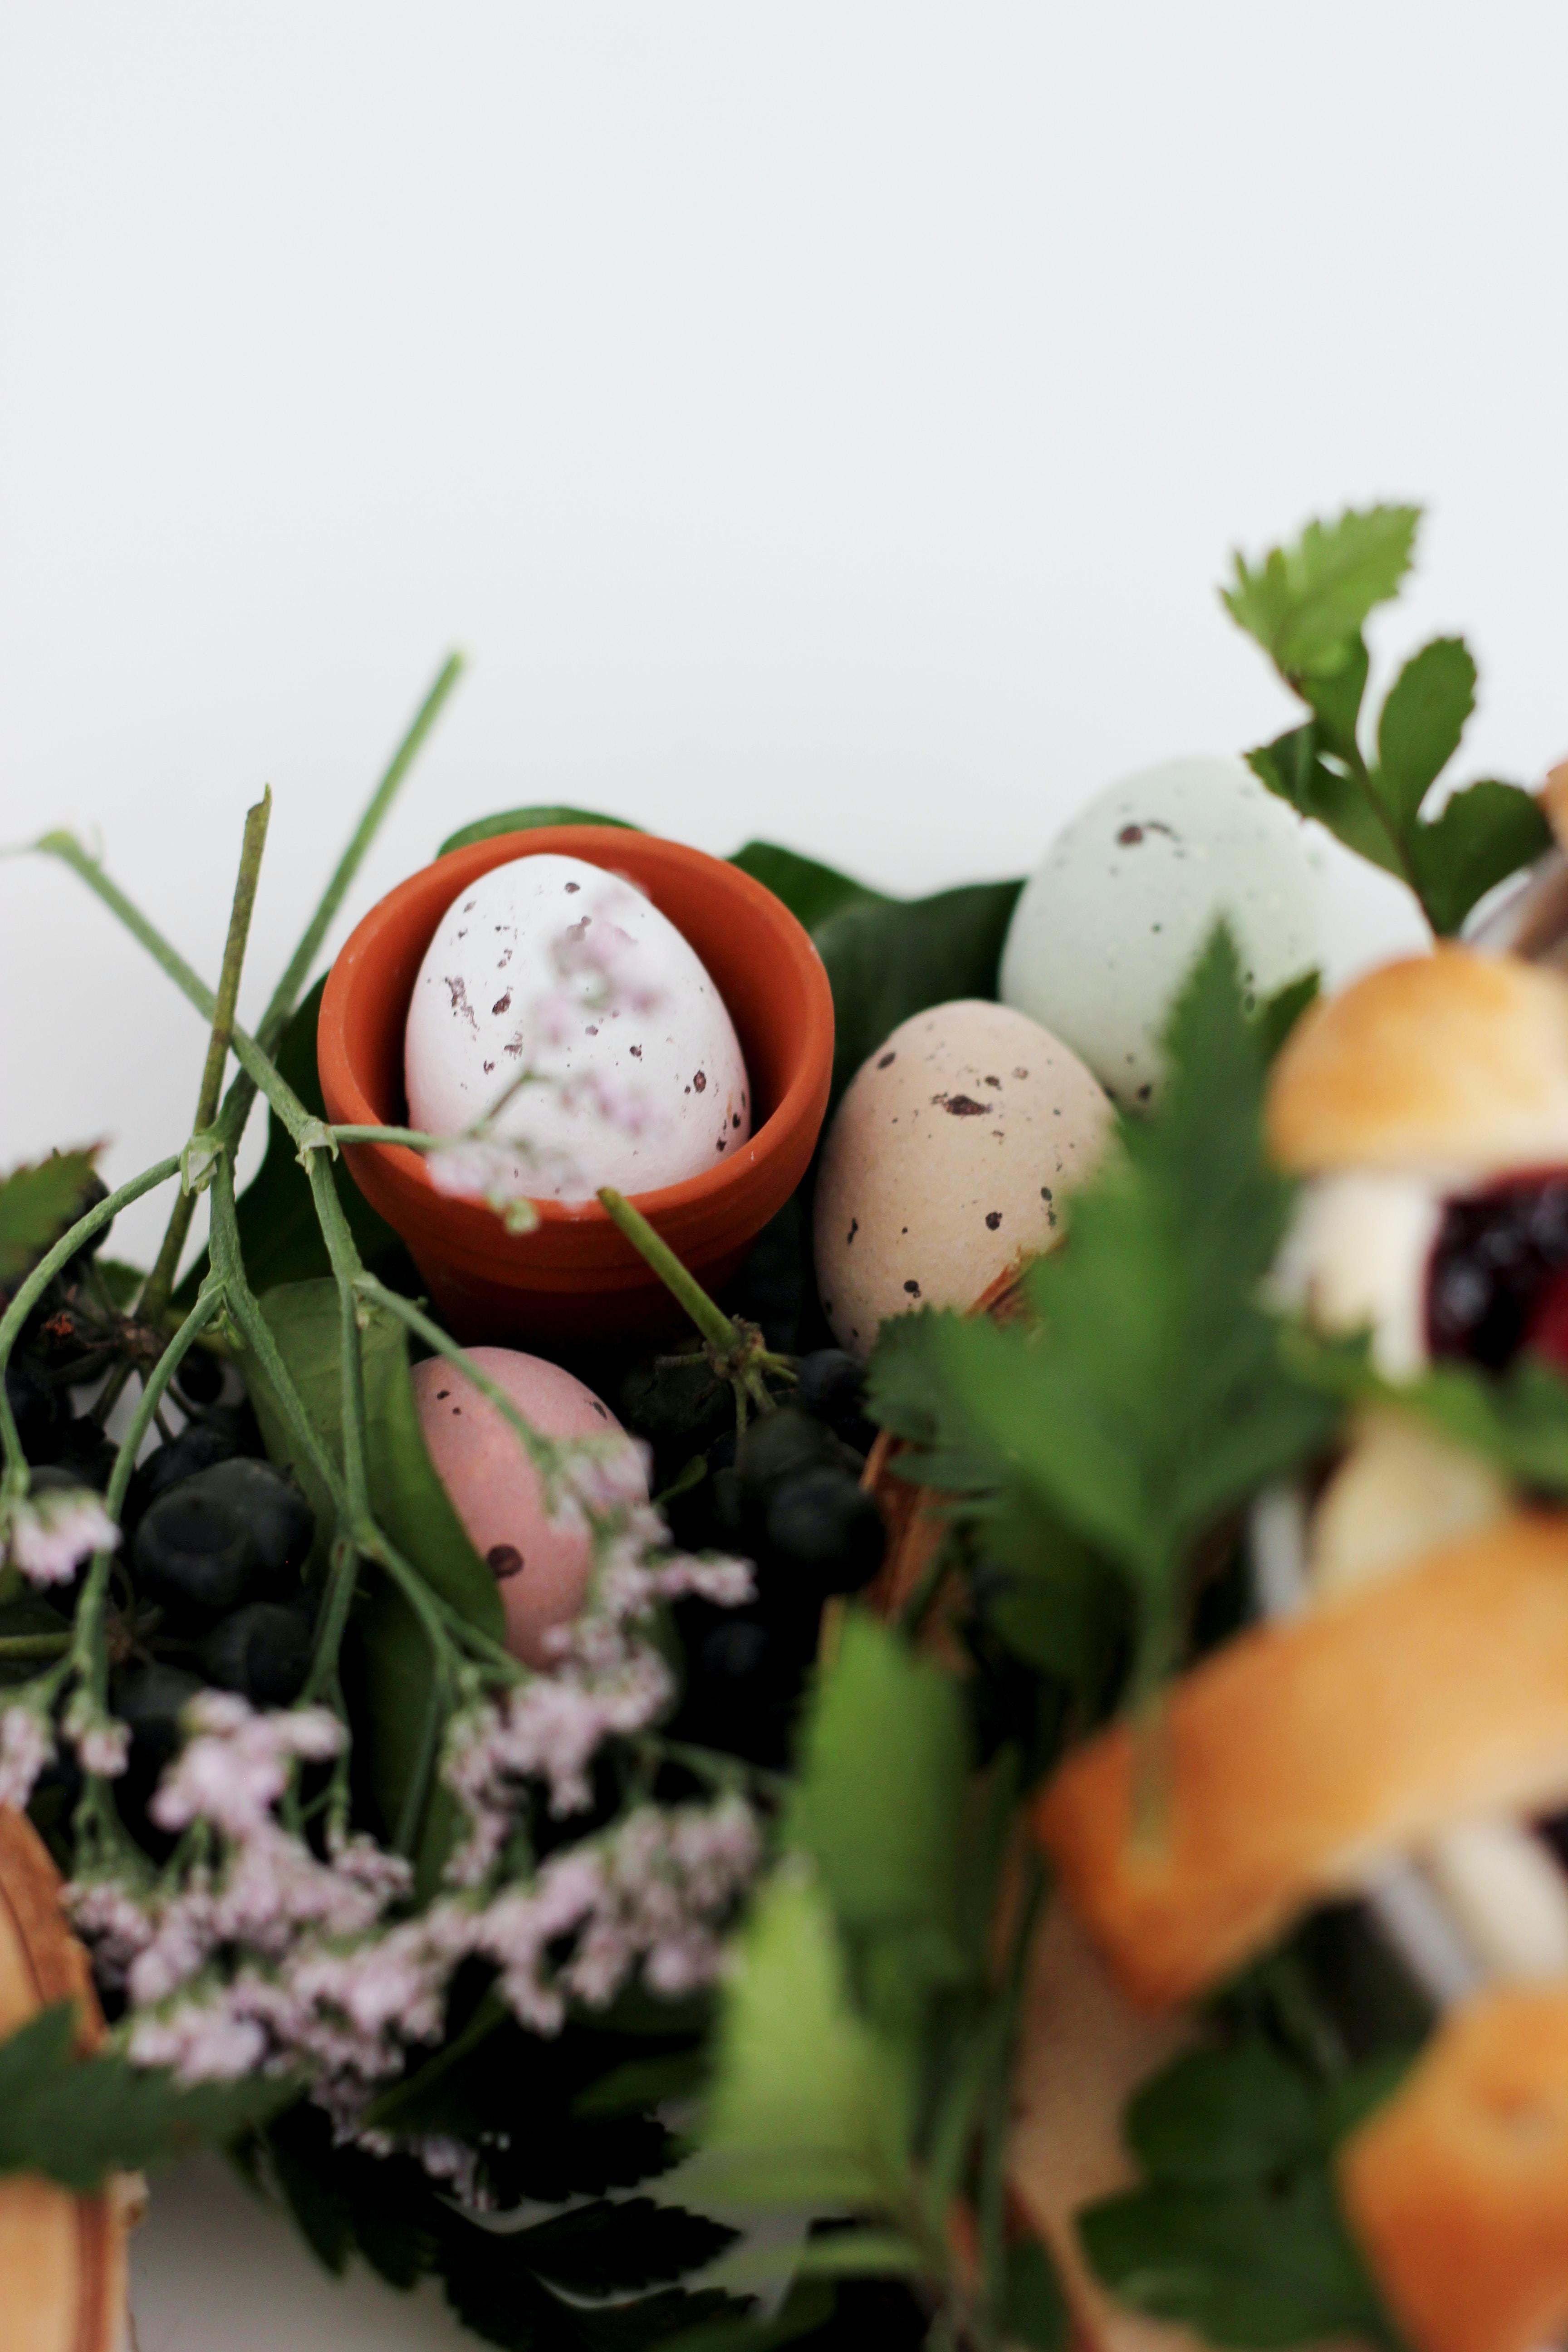 assorted-color organic eggs beside pink petaled flower